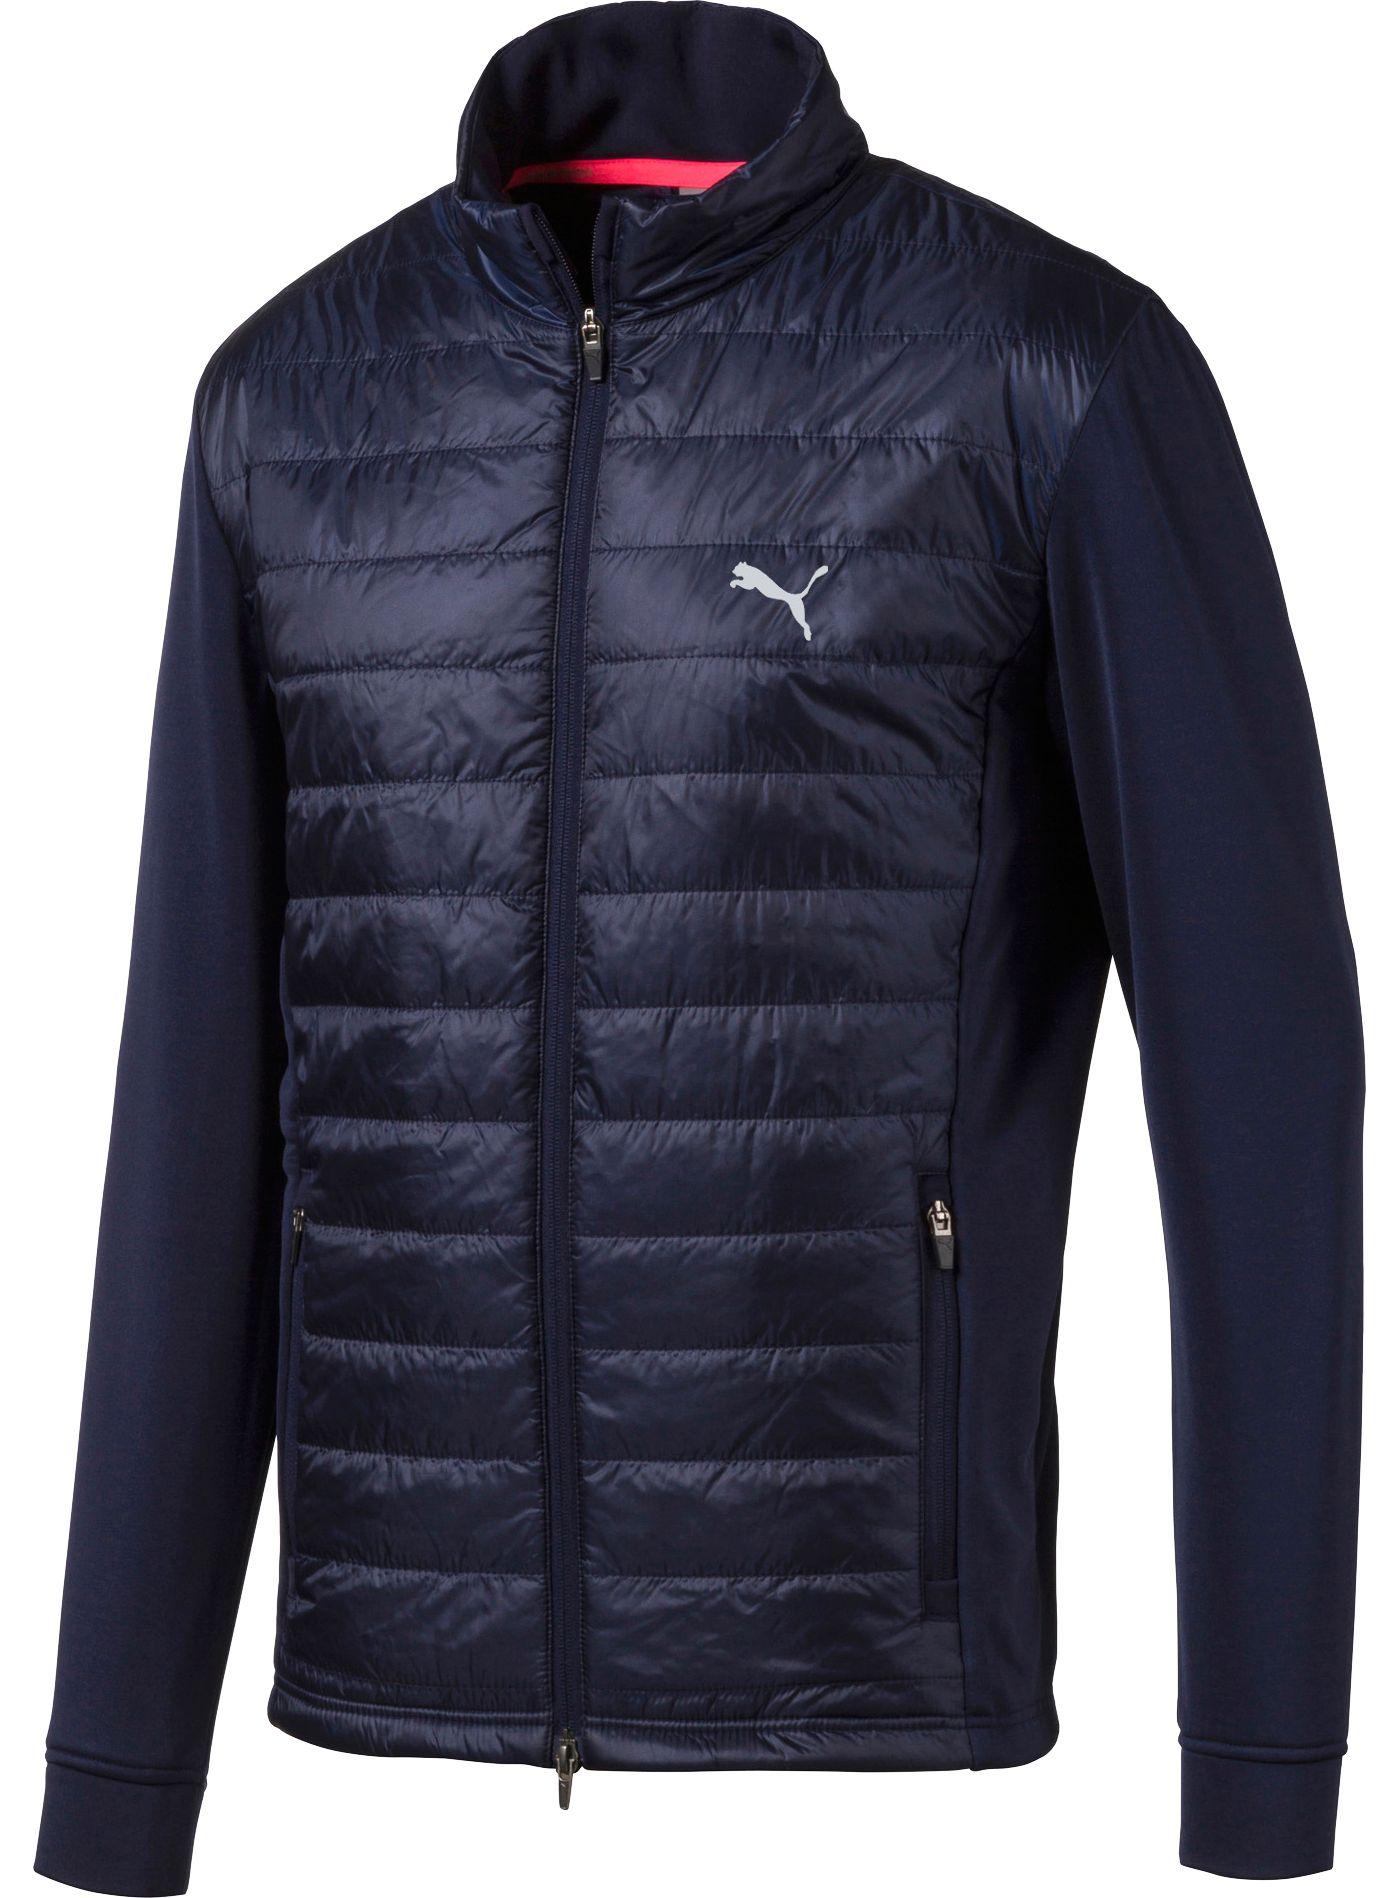 PUMA Men's Primaloft Golf Jacket